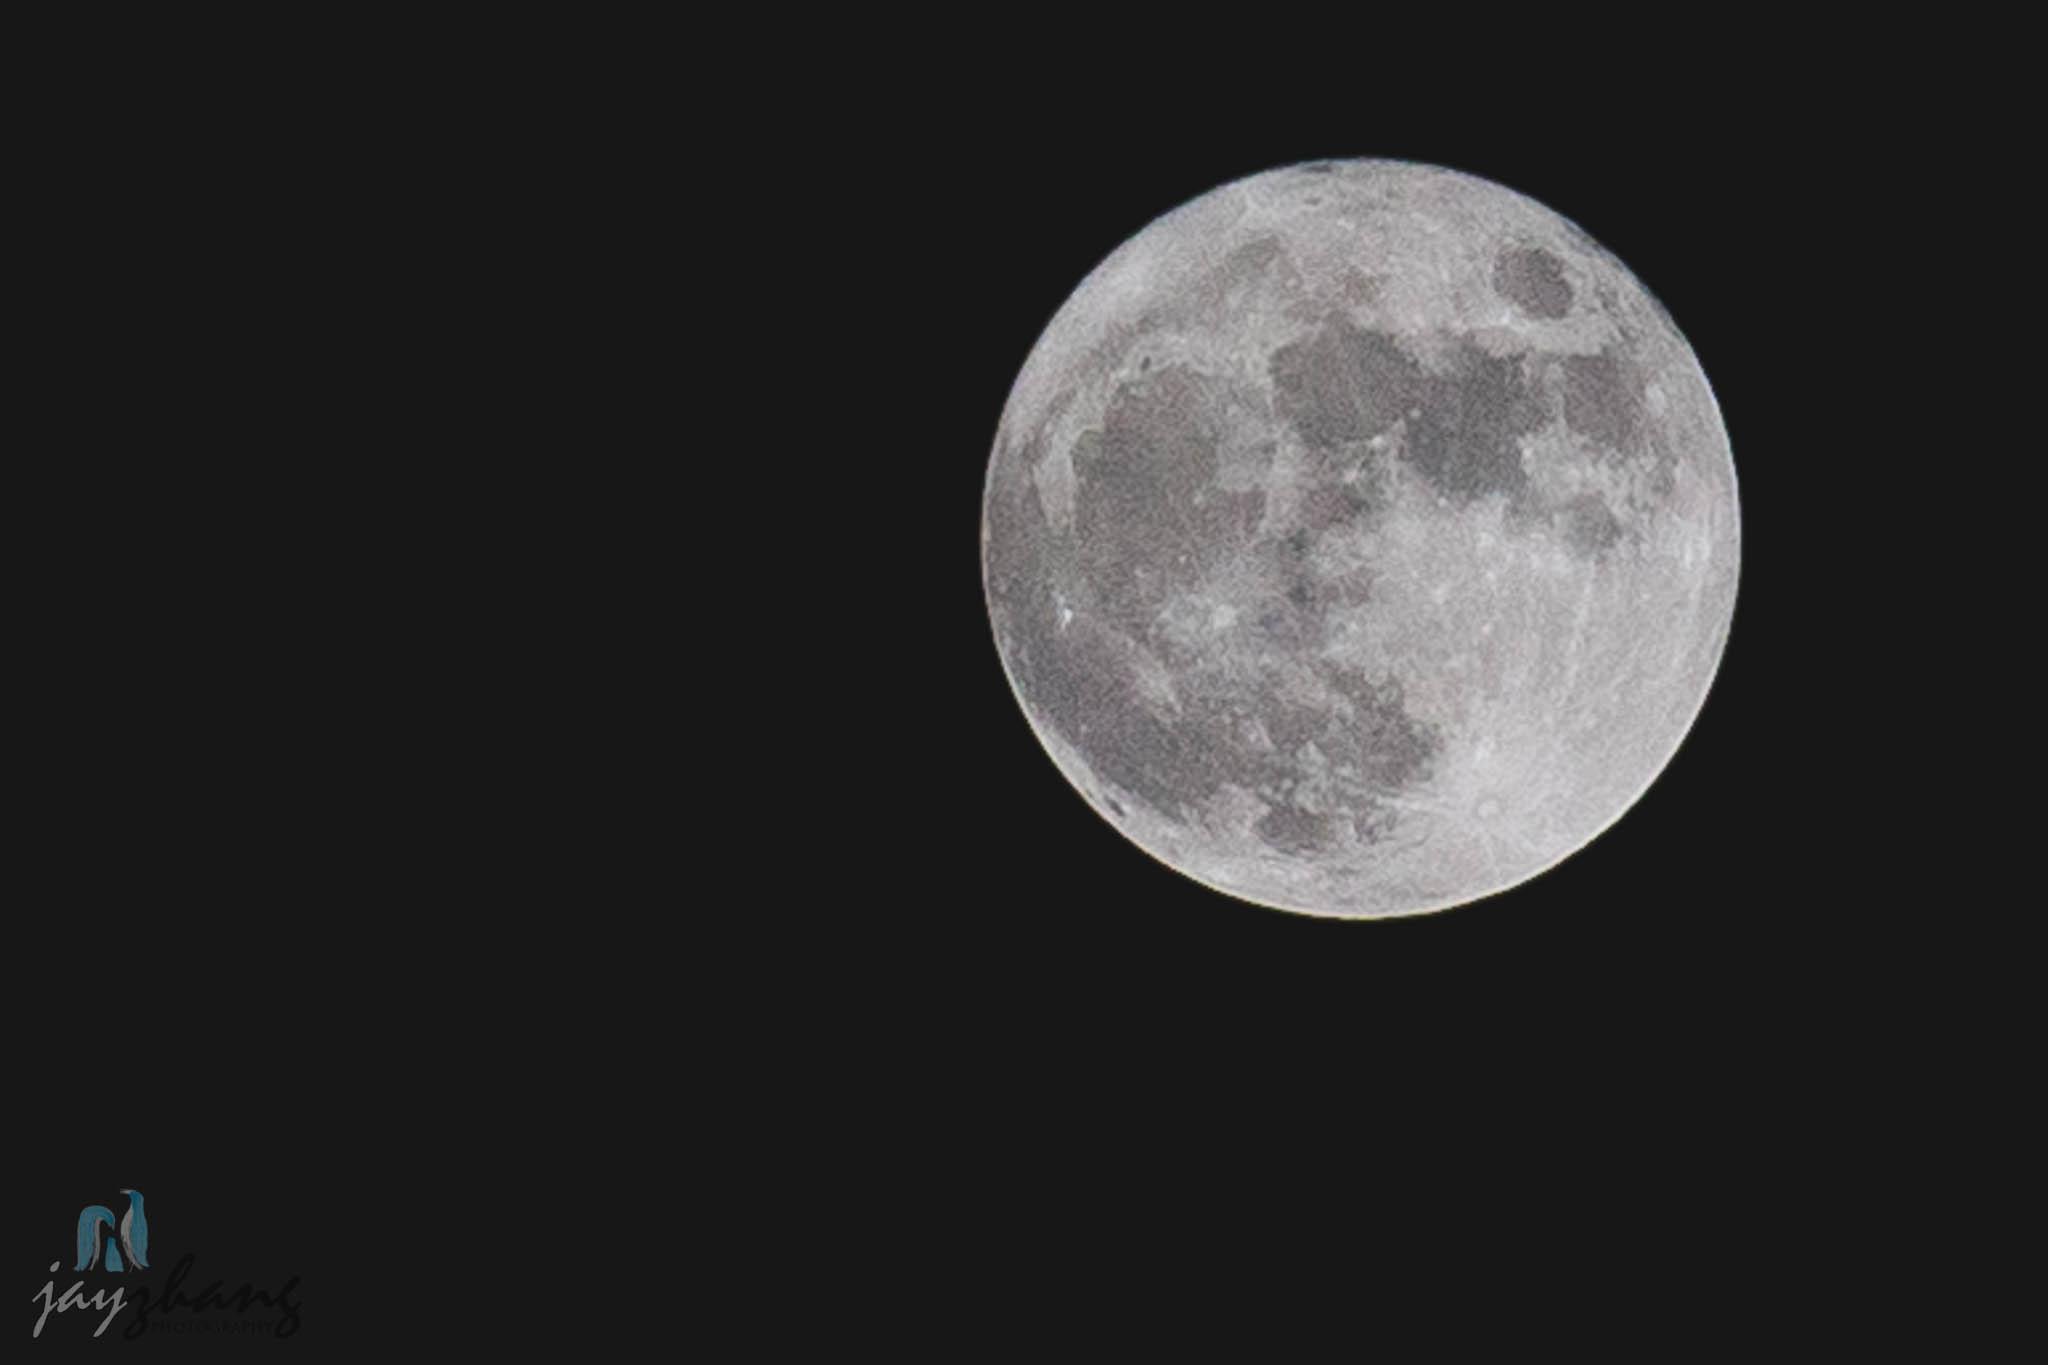 Day 333 - Taurus Moon